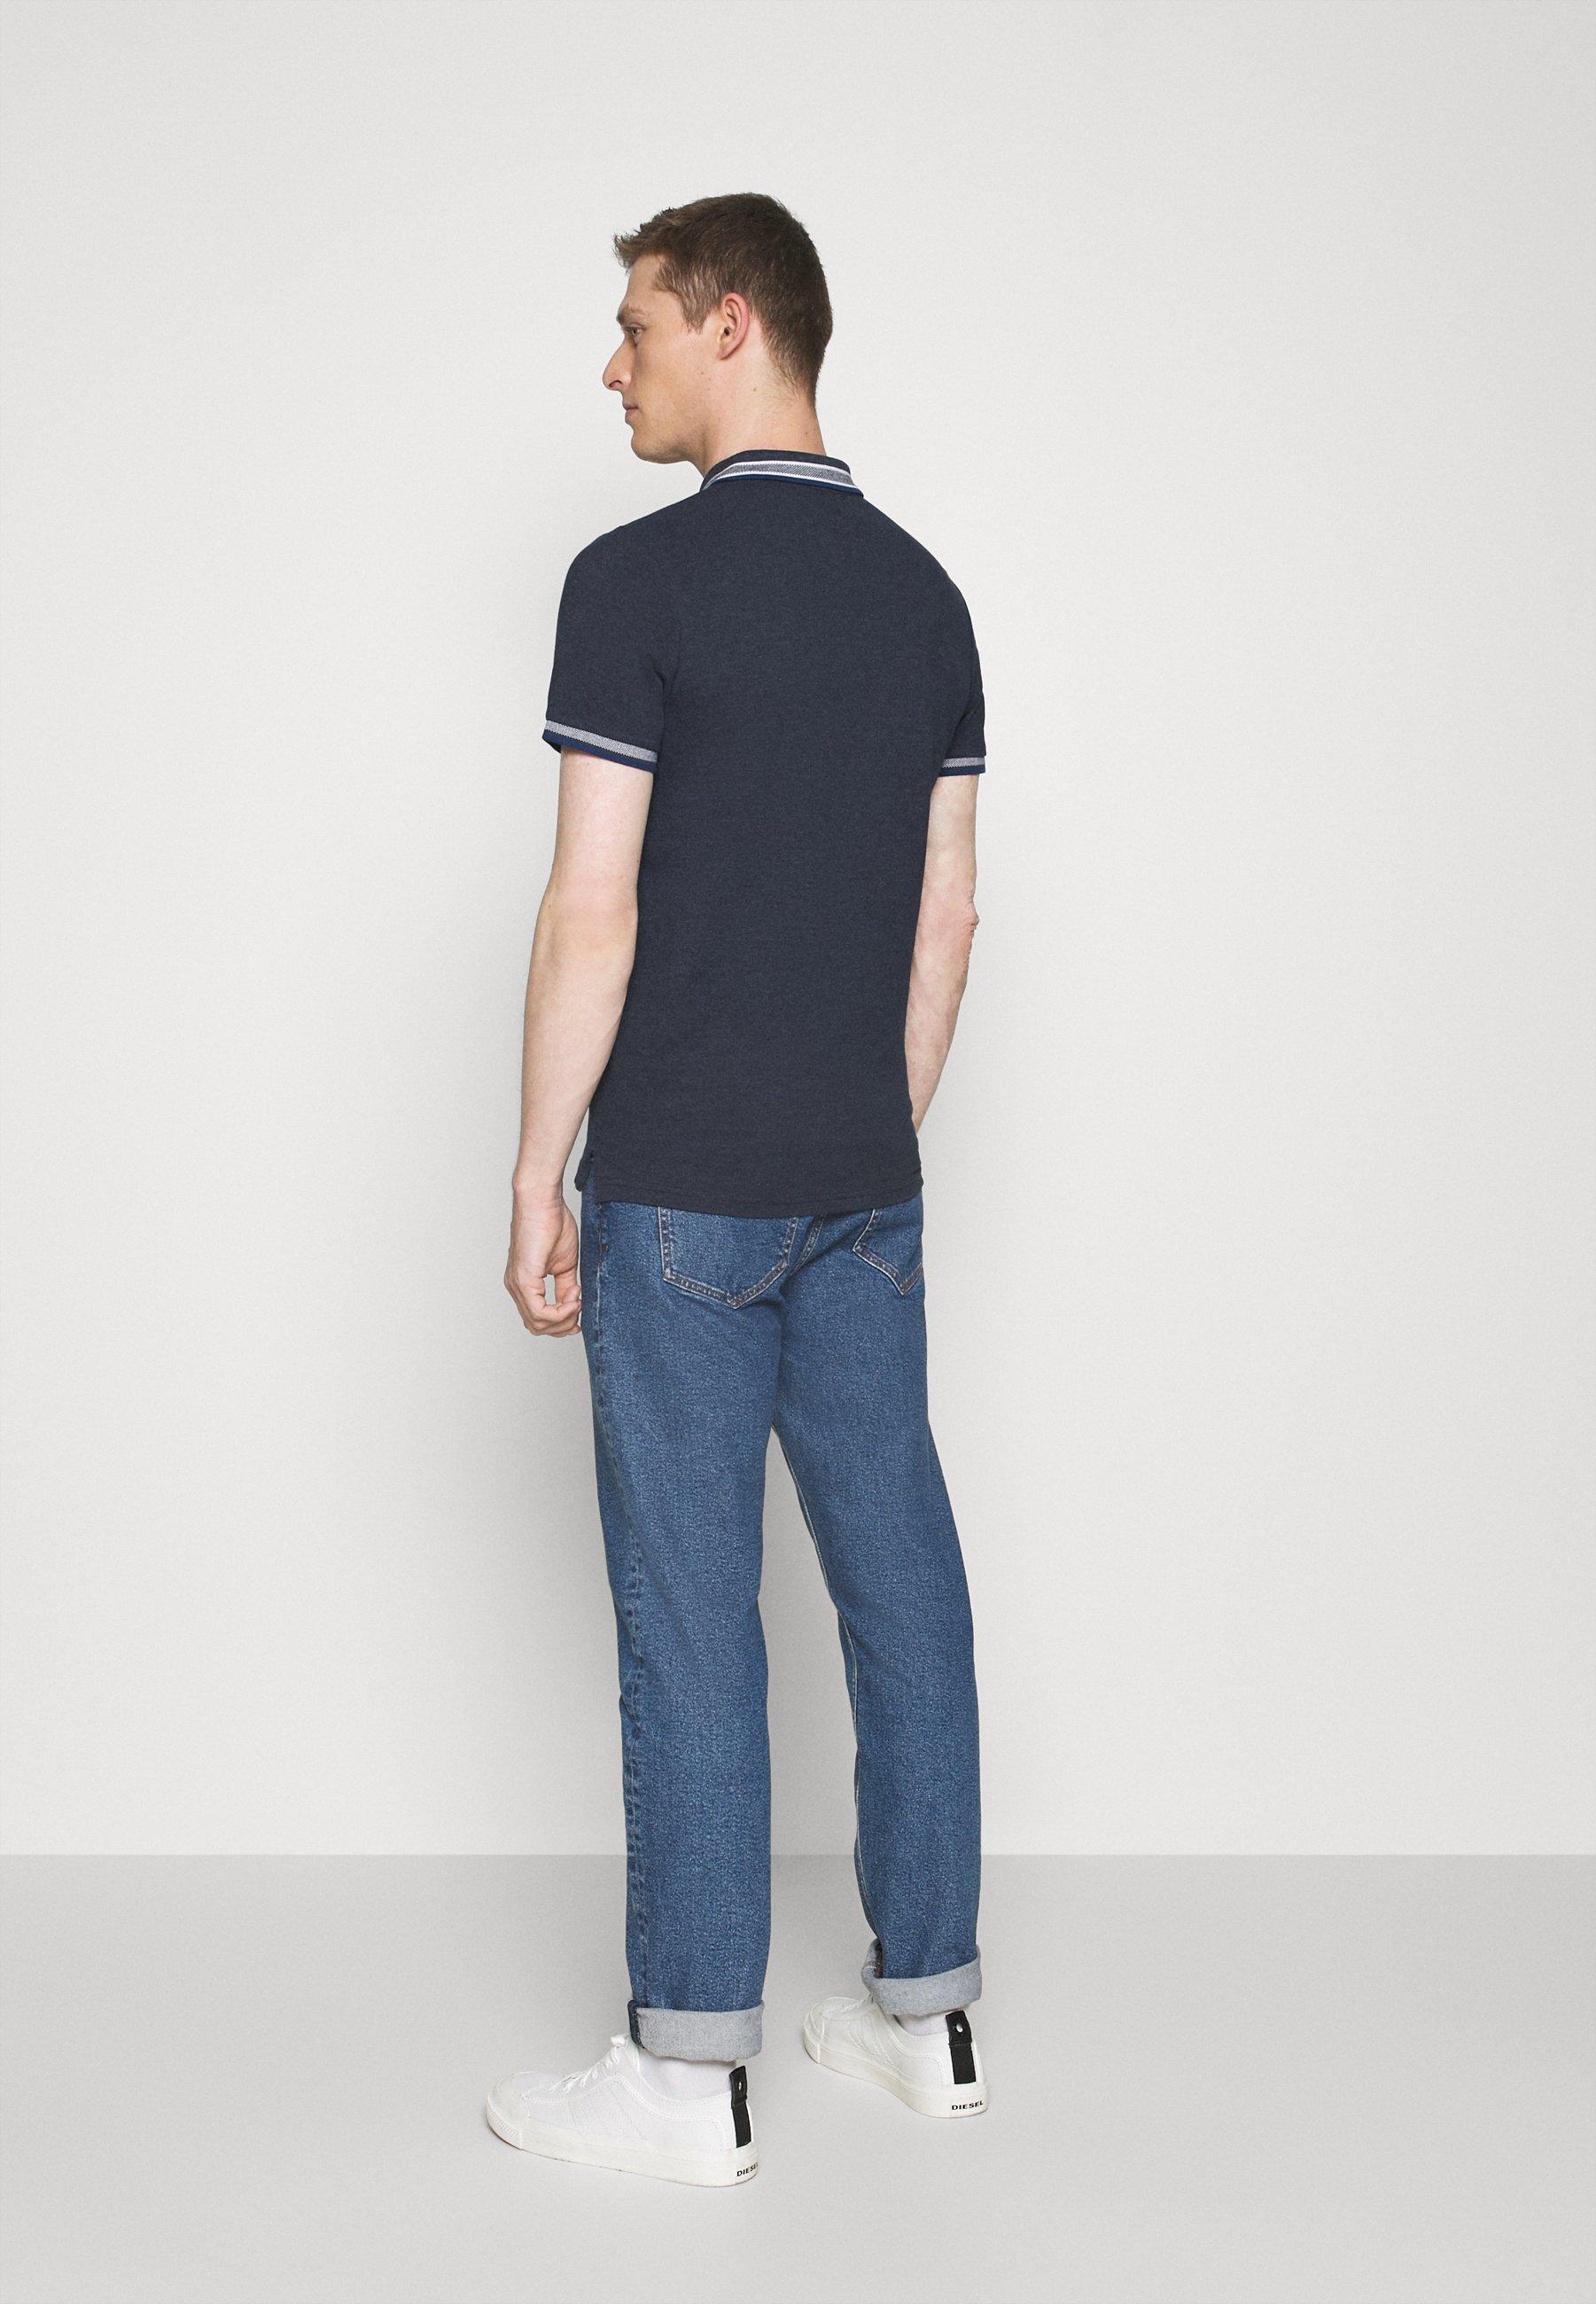 TOM TAILOR WORDING TIPPING - Polo shirt - dark blue L2BMK